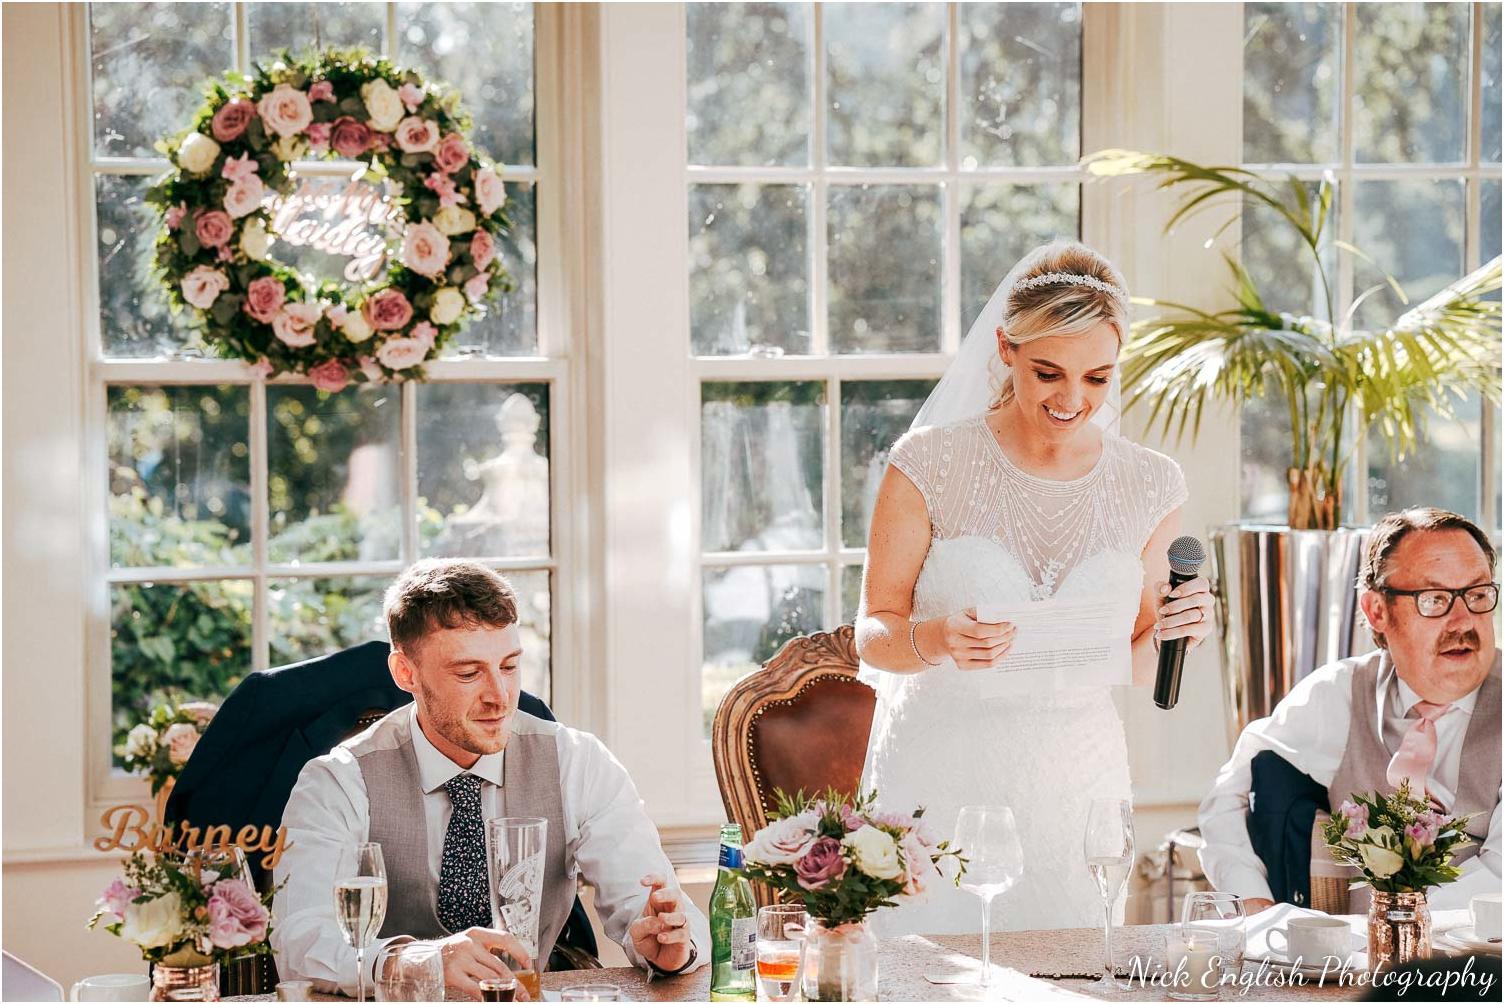 Mitton_Hall_Wedding_Photograph-156.jpg